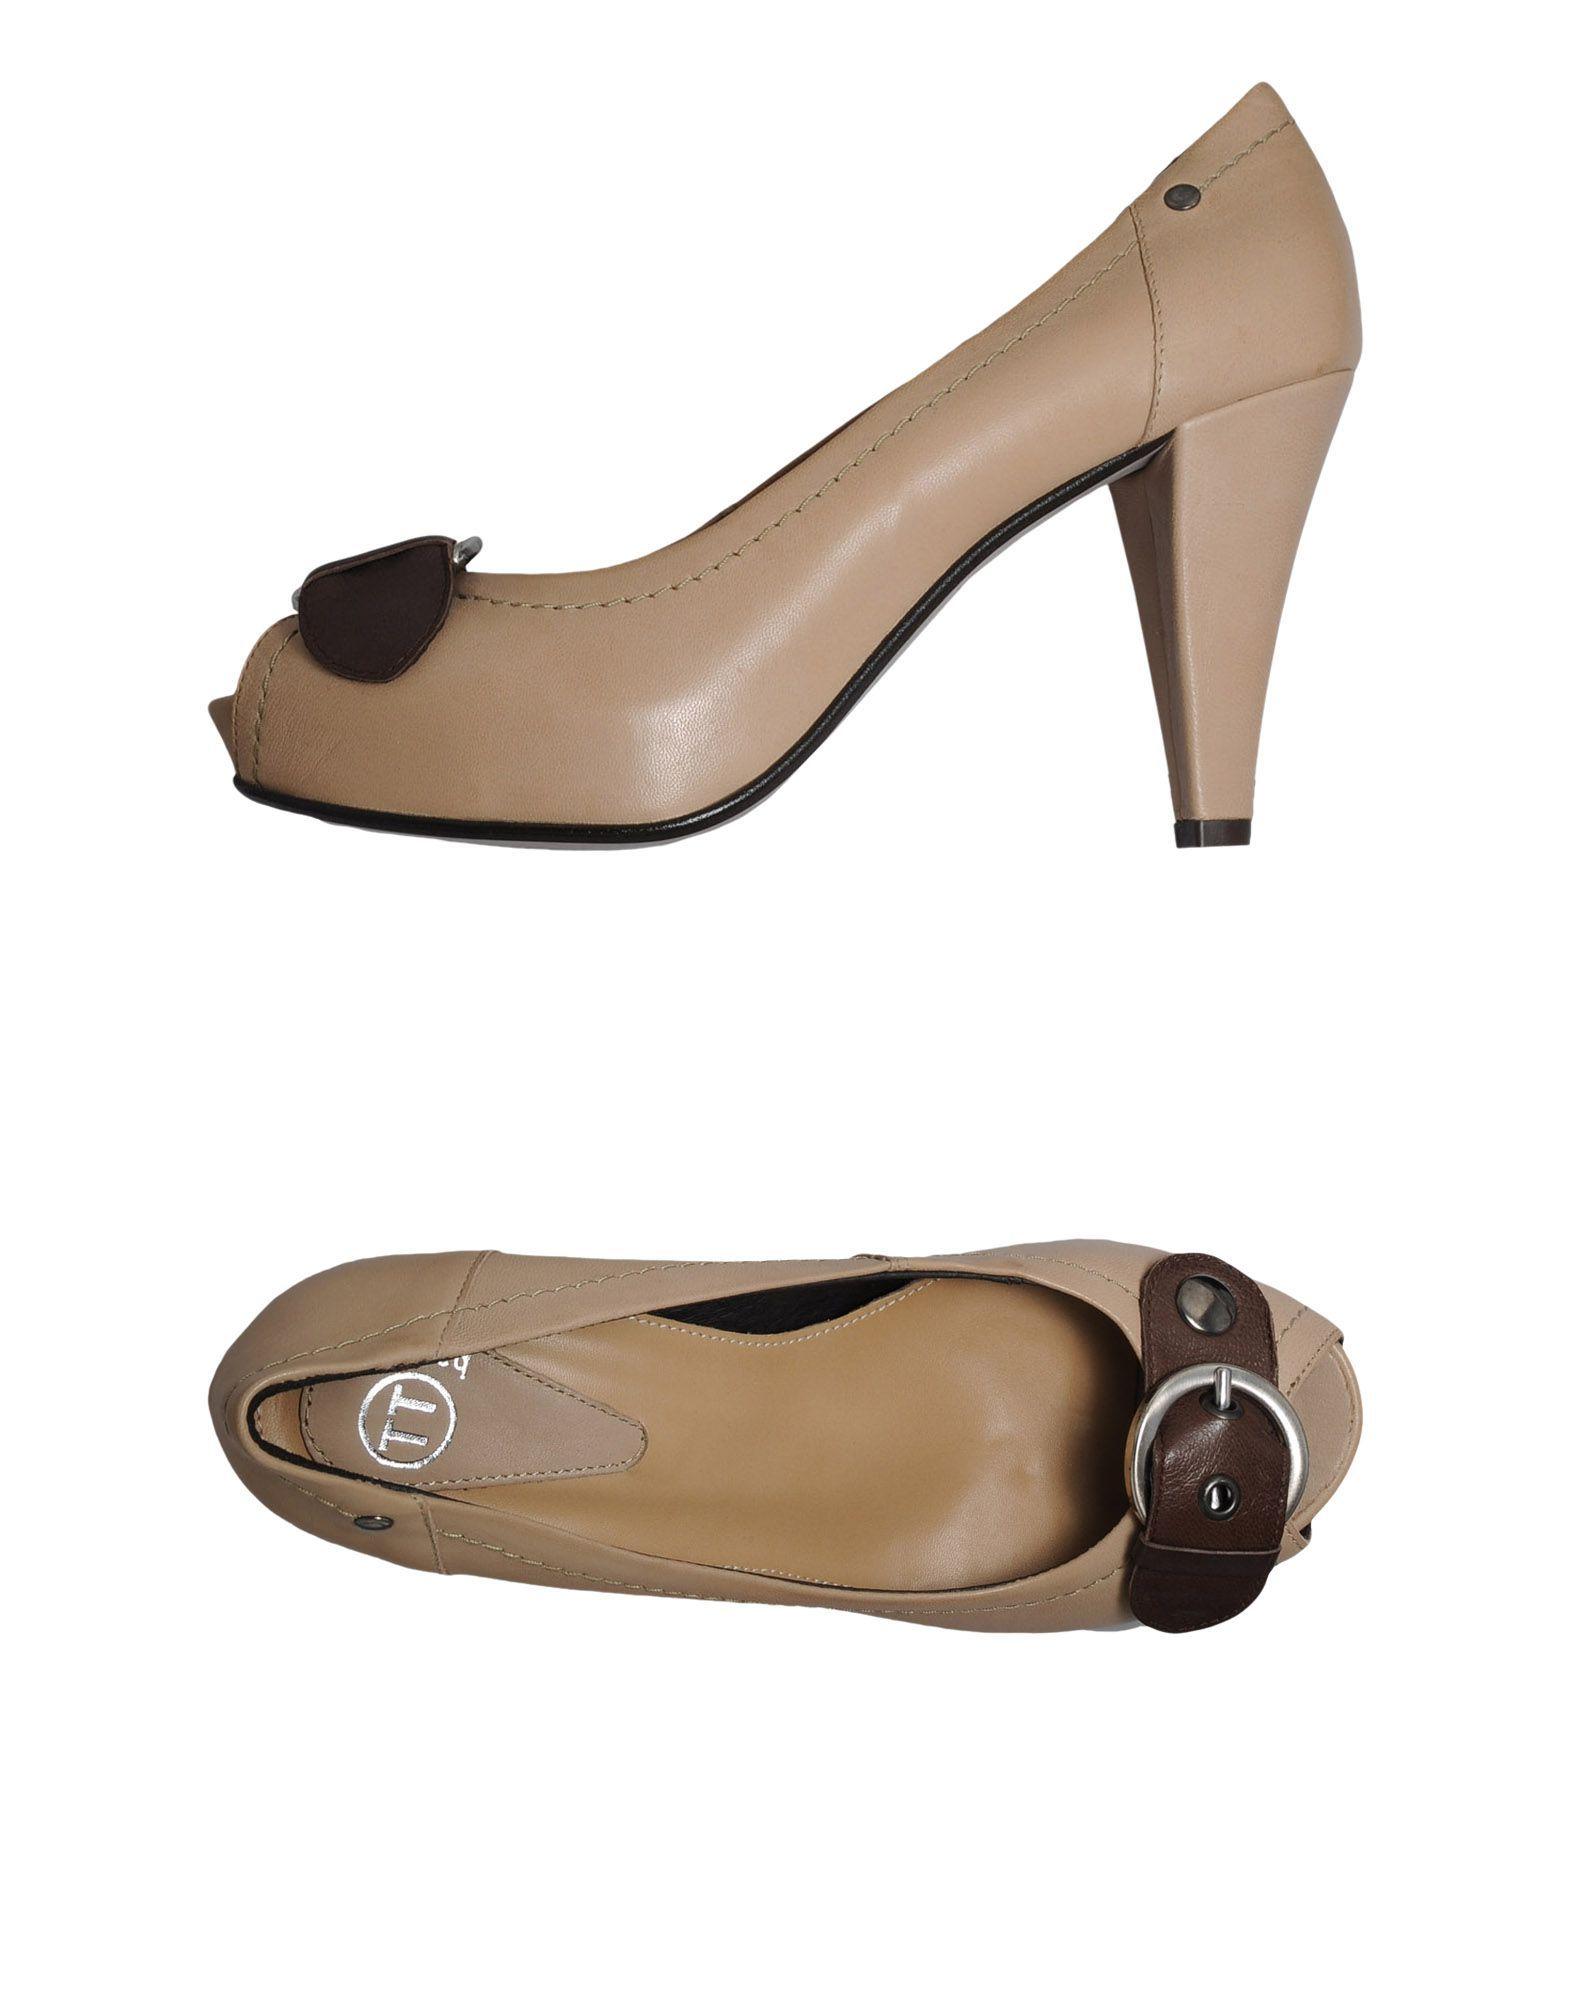 Bagatt Sur Yoox Femme Walking Escarpins Chaussures Qrpwaoqxt